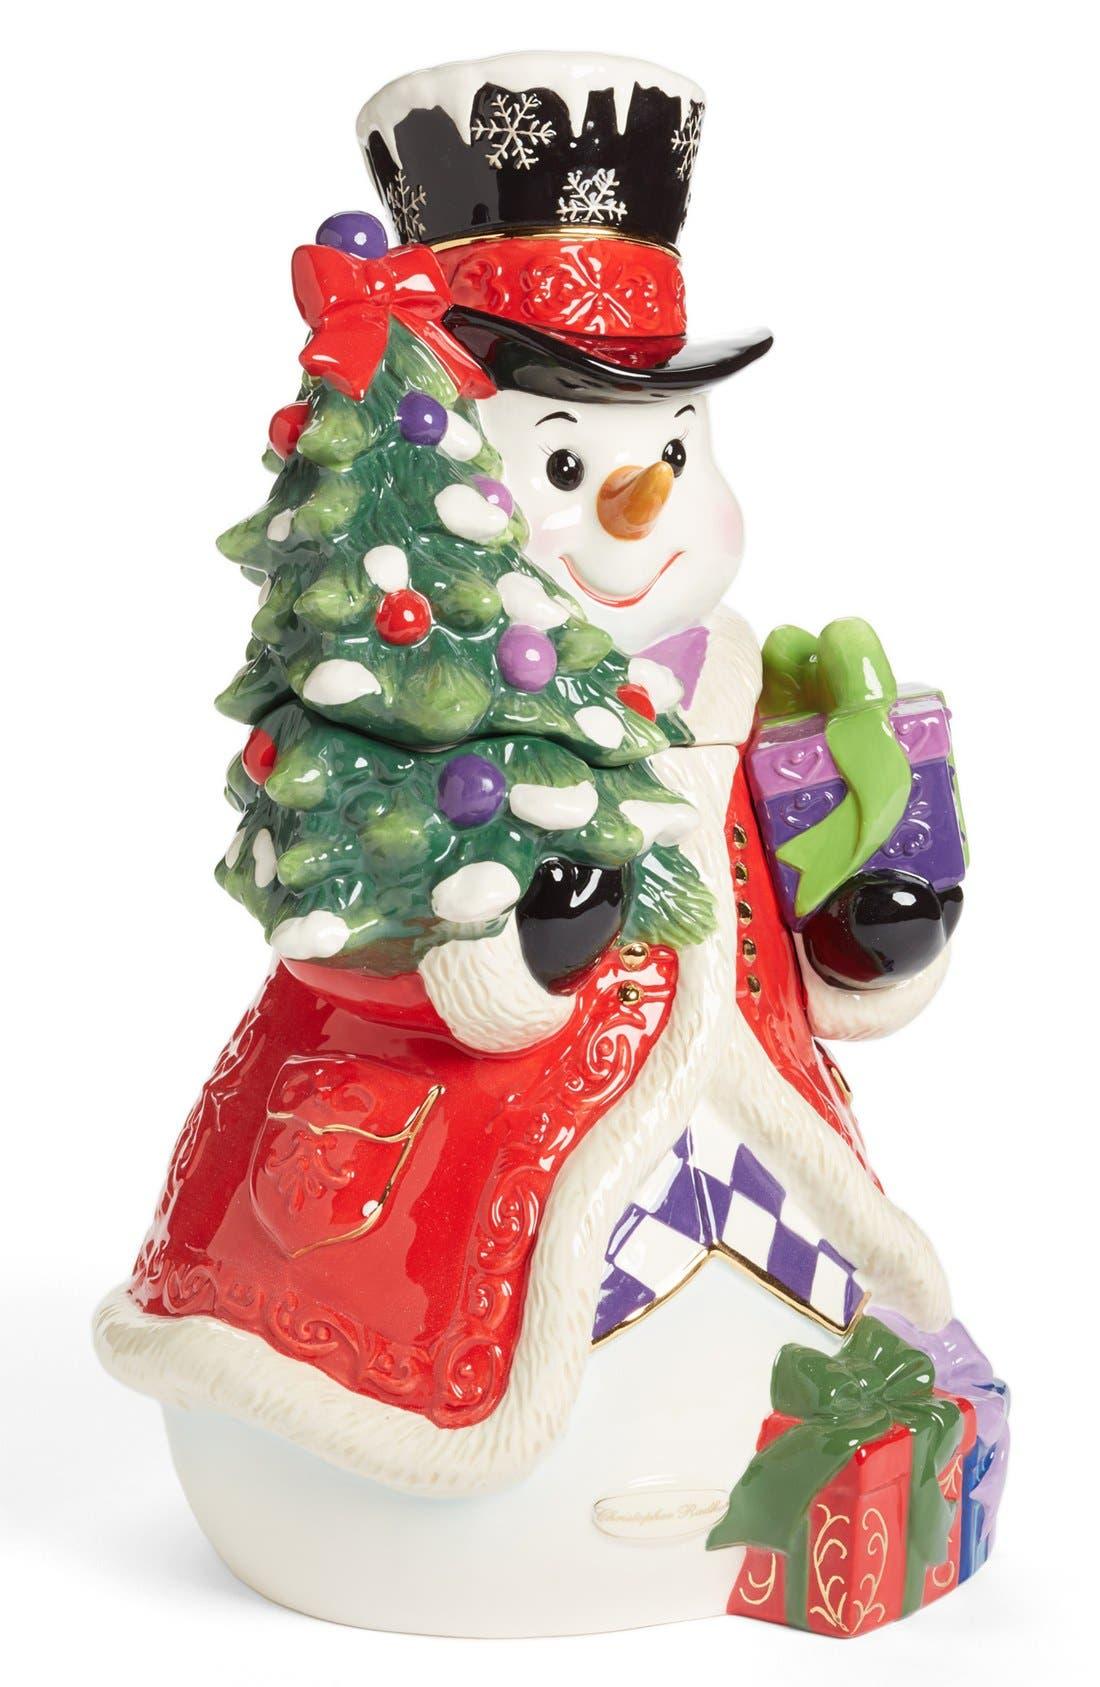 Alternate Image 1 Selected - Christopher Radko 'Stately Snowman' Cookie Jar